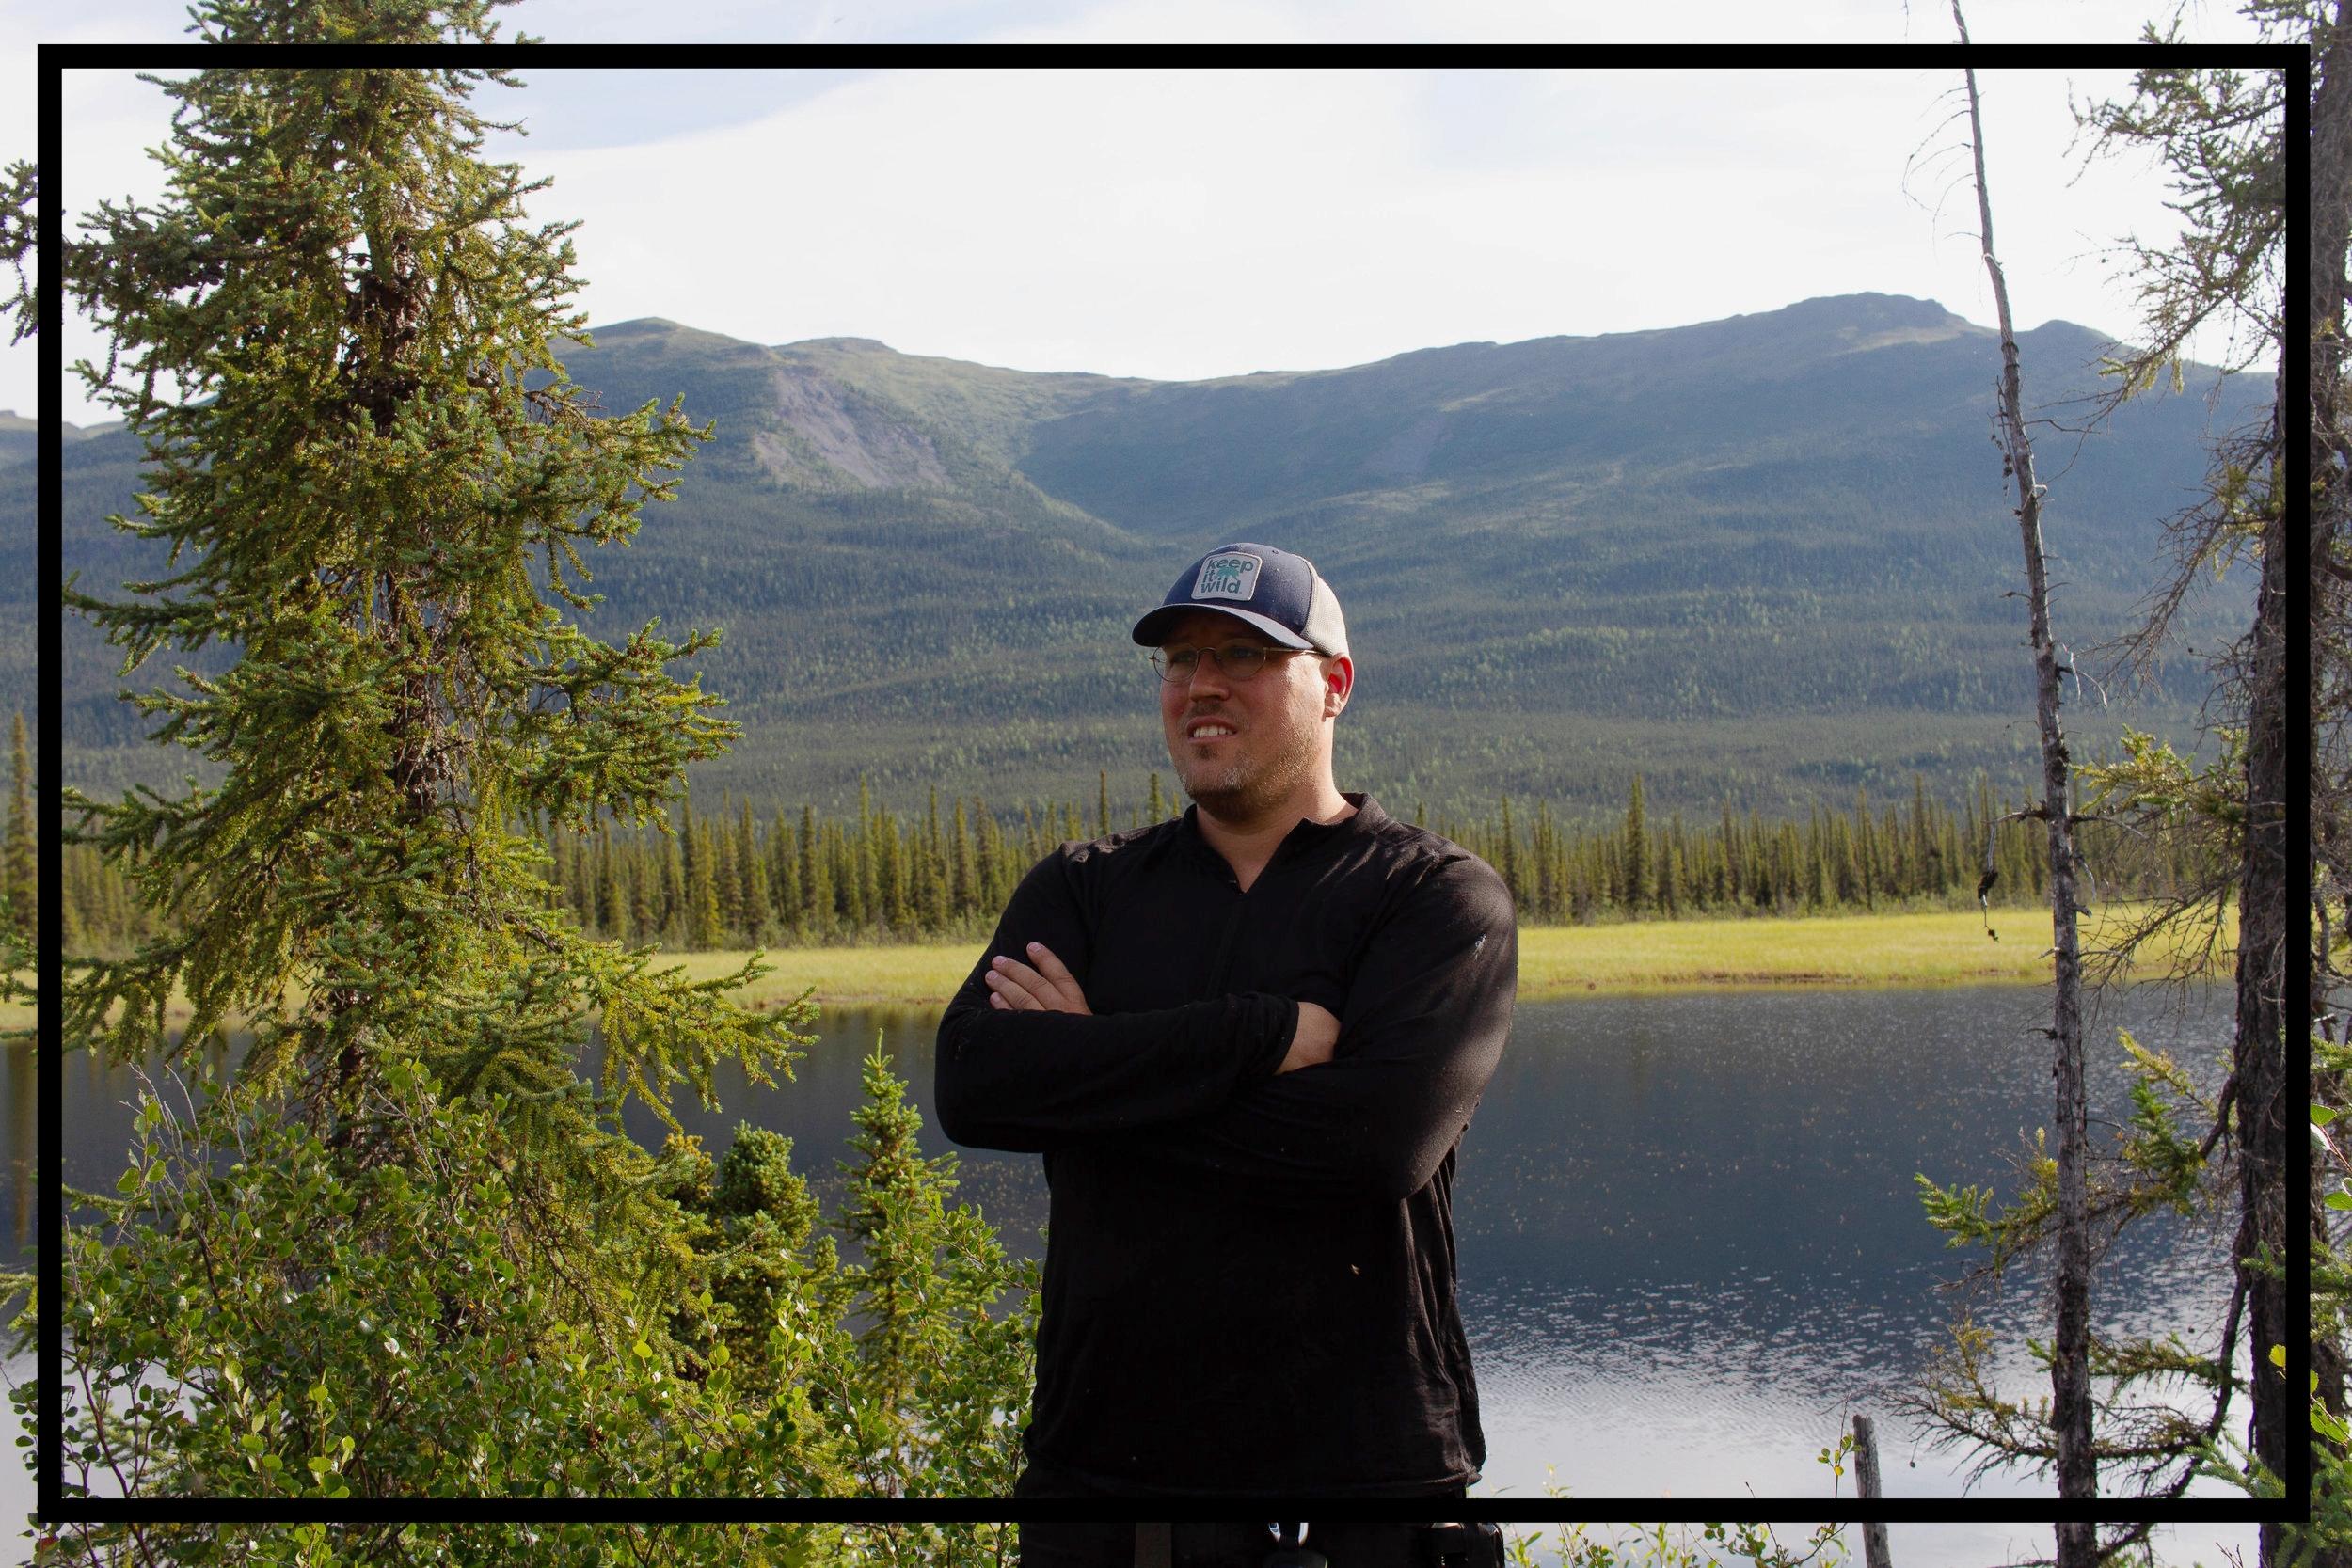 Michael D. Brannan - Gates of The Arctic National Park, Alaska 2018.